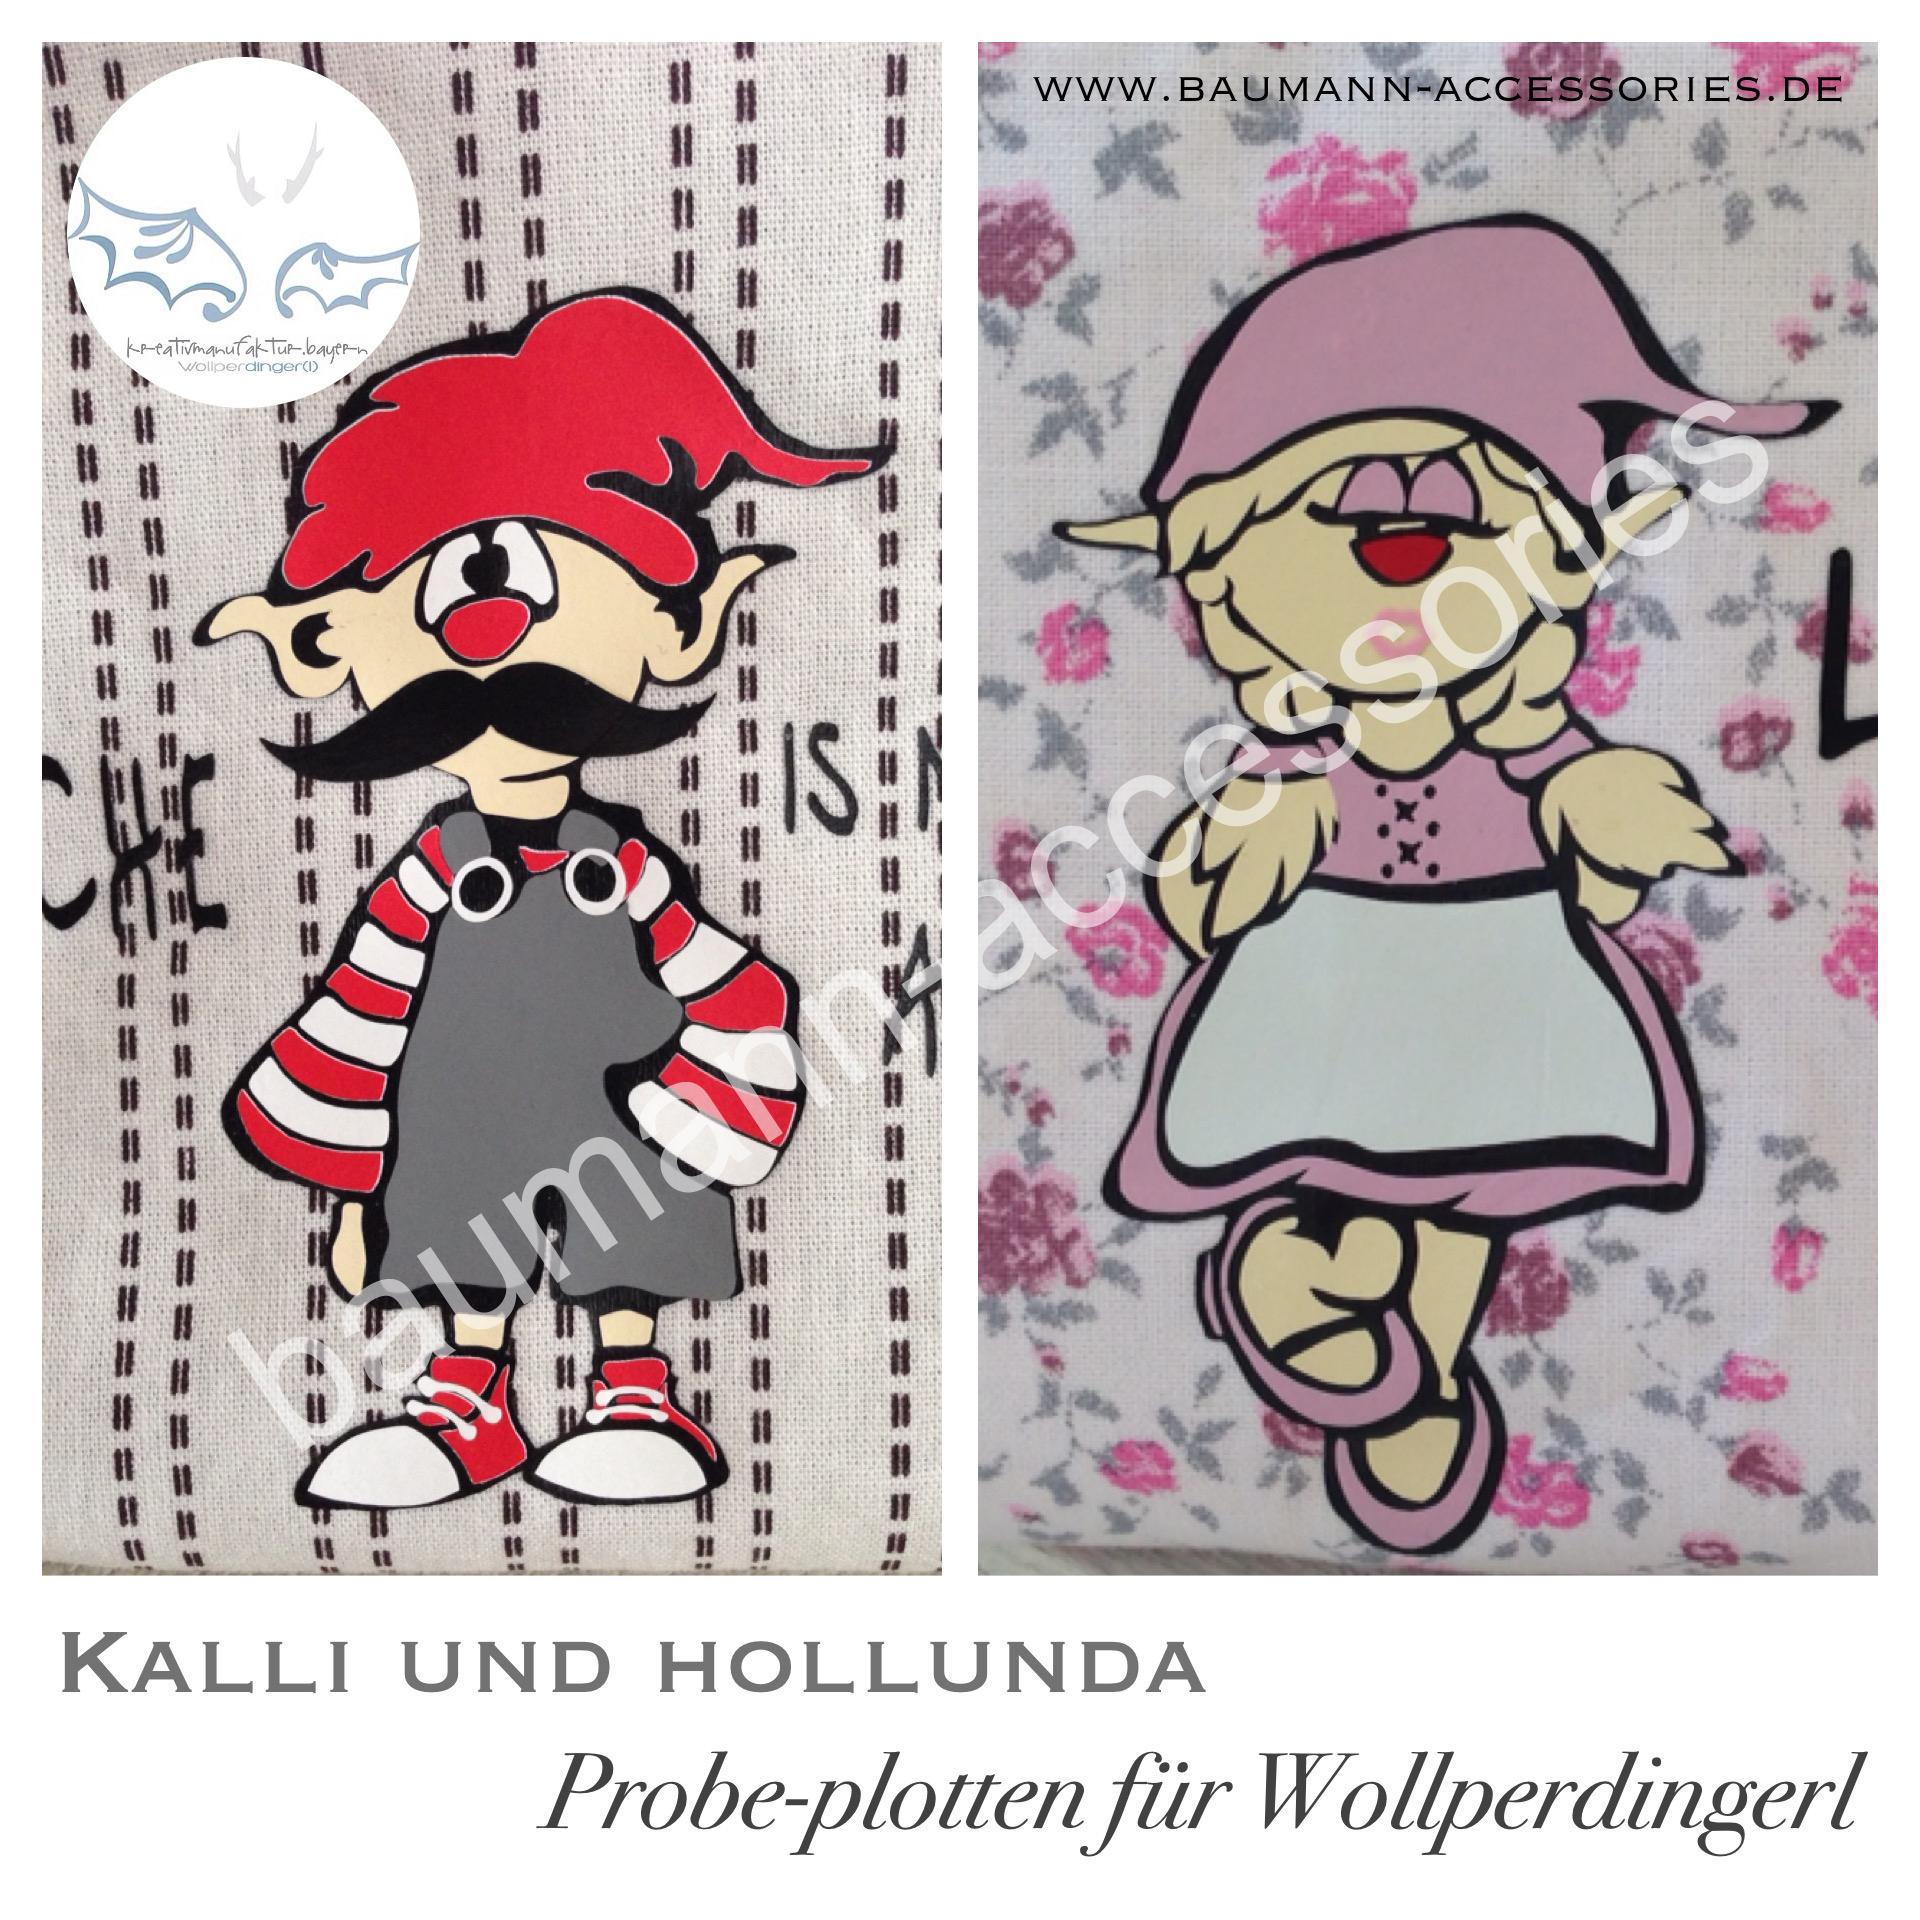 Hollunda & Kalli